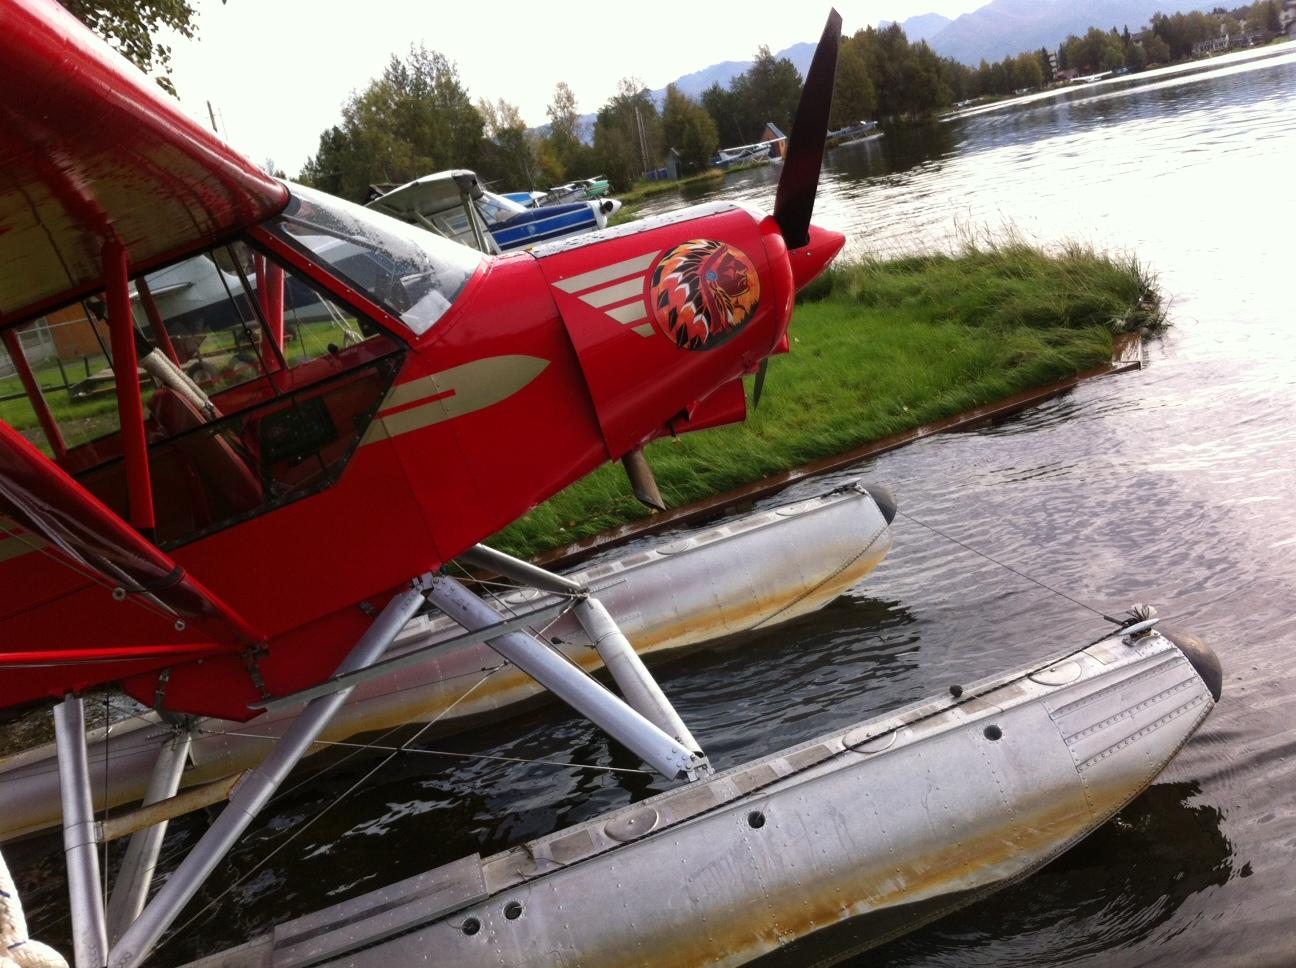 Cub Nose Art at Lake Hood   Alaskafoto - Aircraft Photography